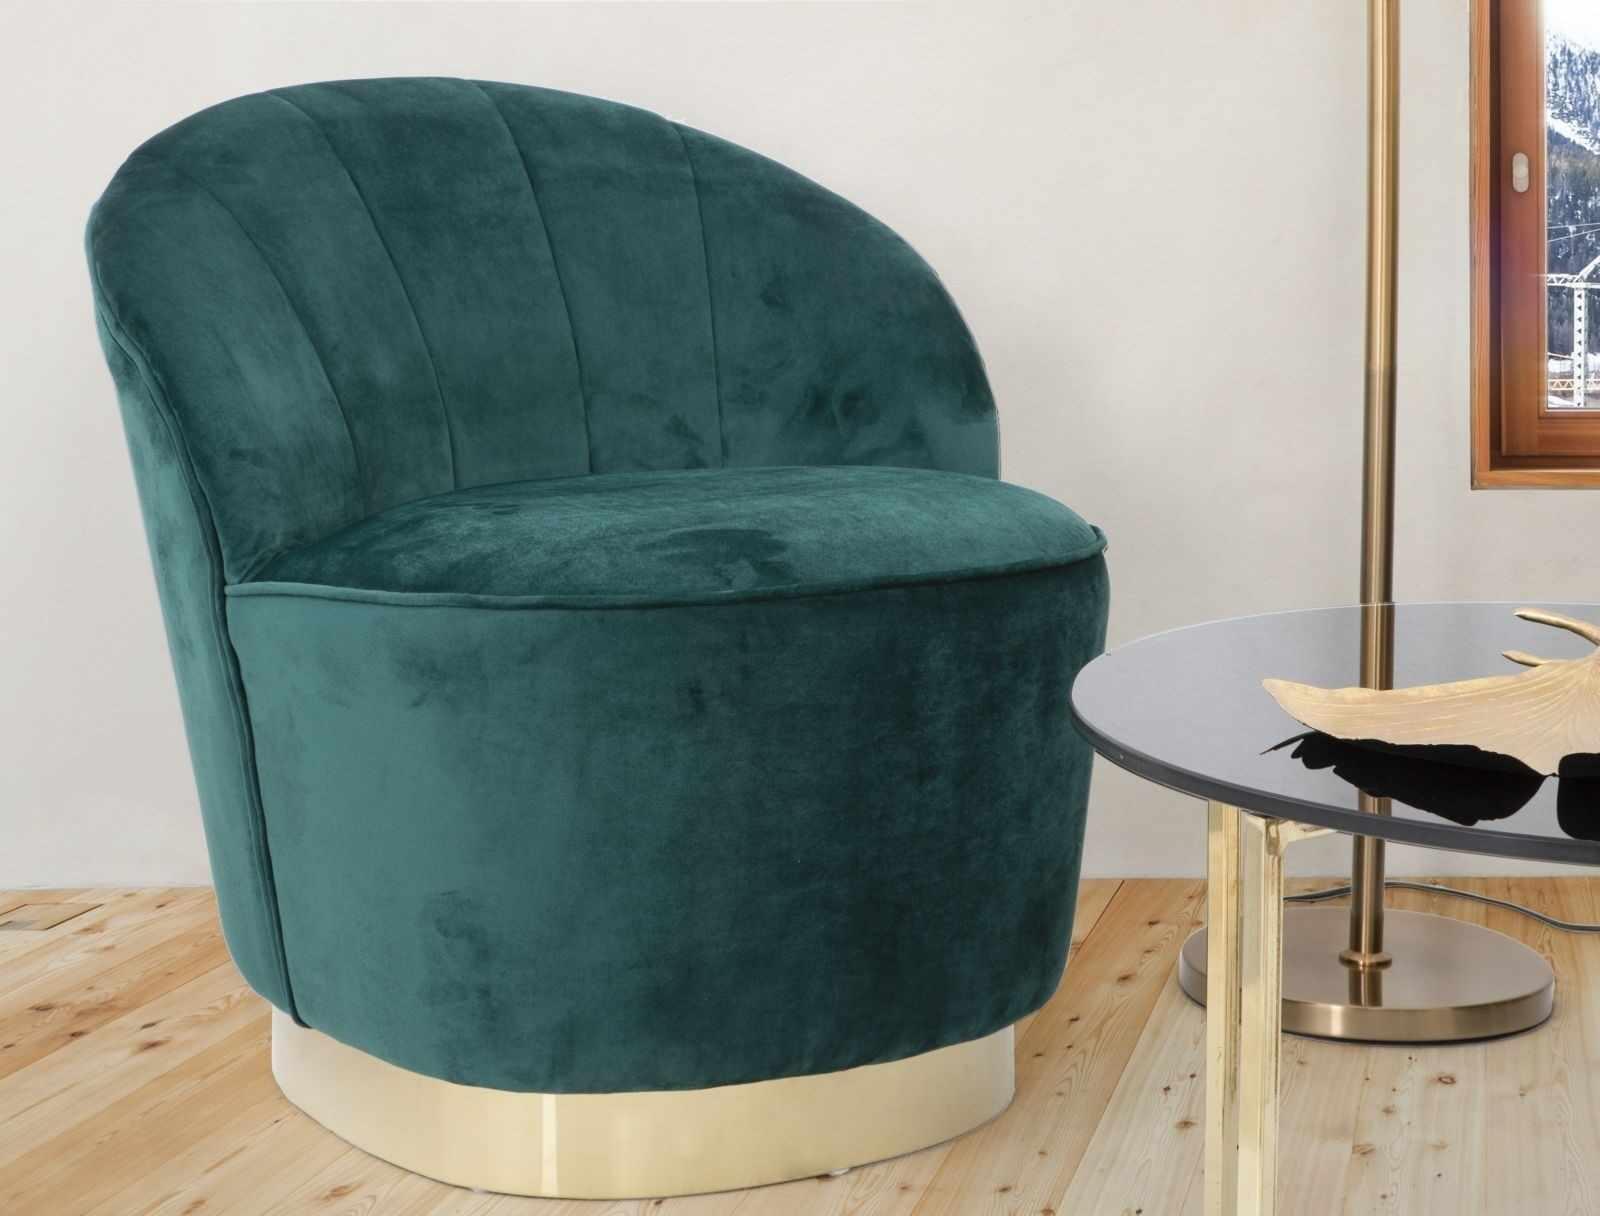 Fotoliu fix tapitat cu stofa Sopy Velvet Verde inchis / Auriu, l67xA71xH70 cm la pret 1572 lei